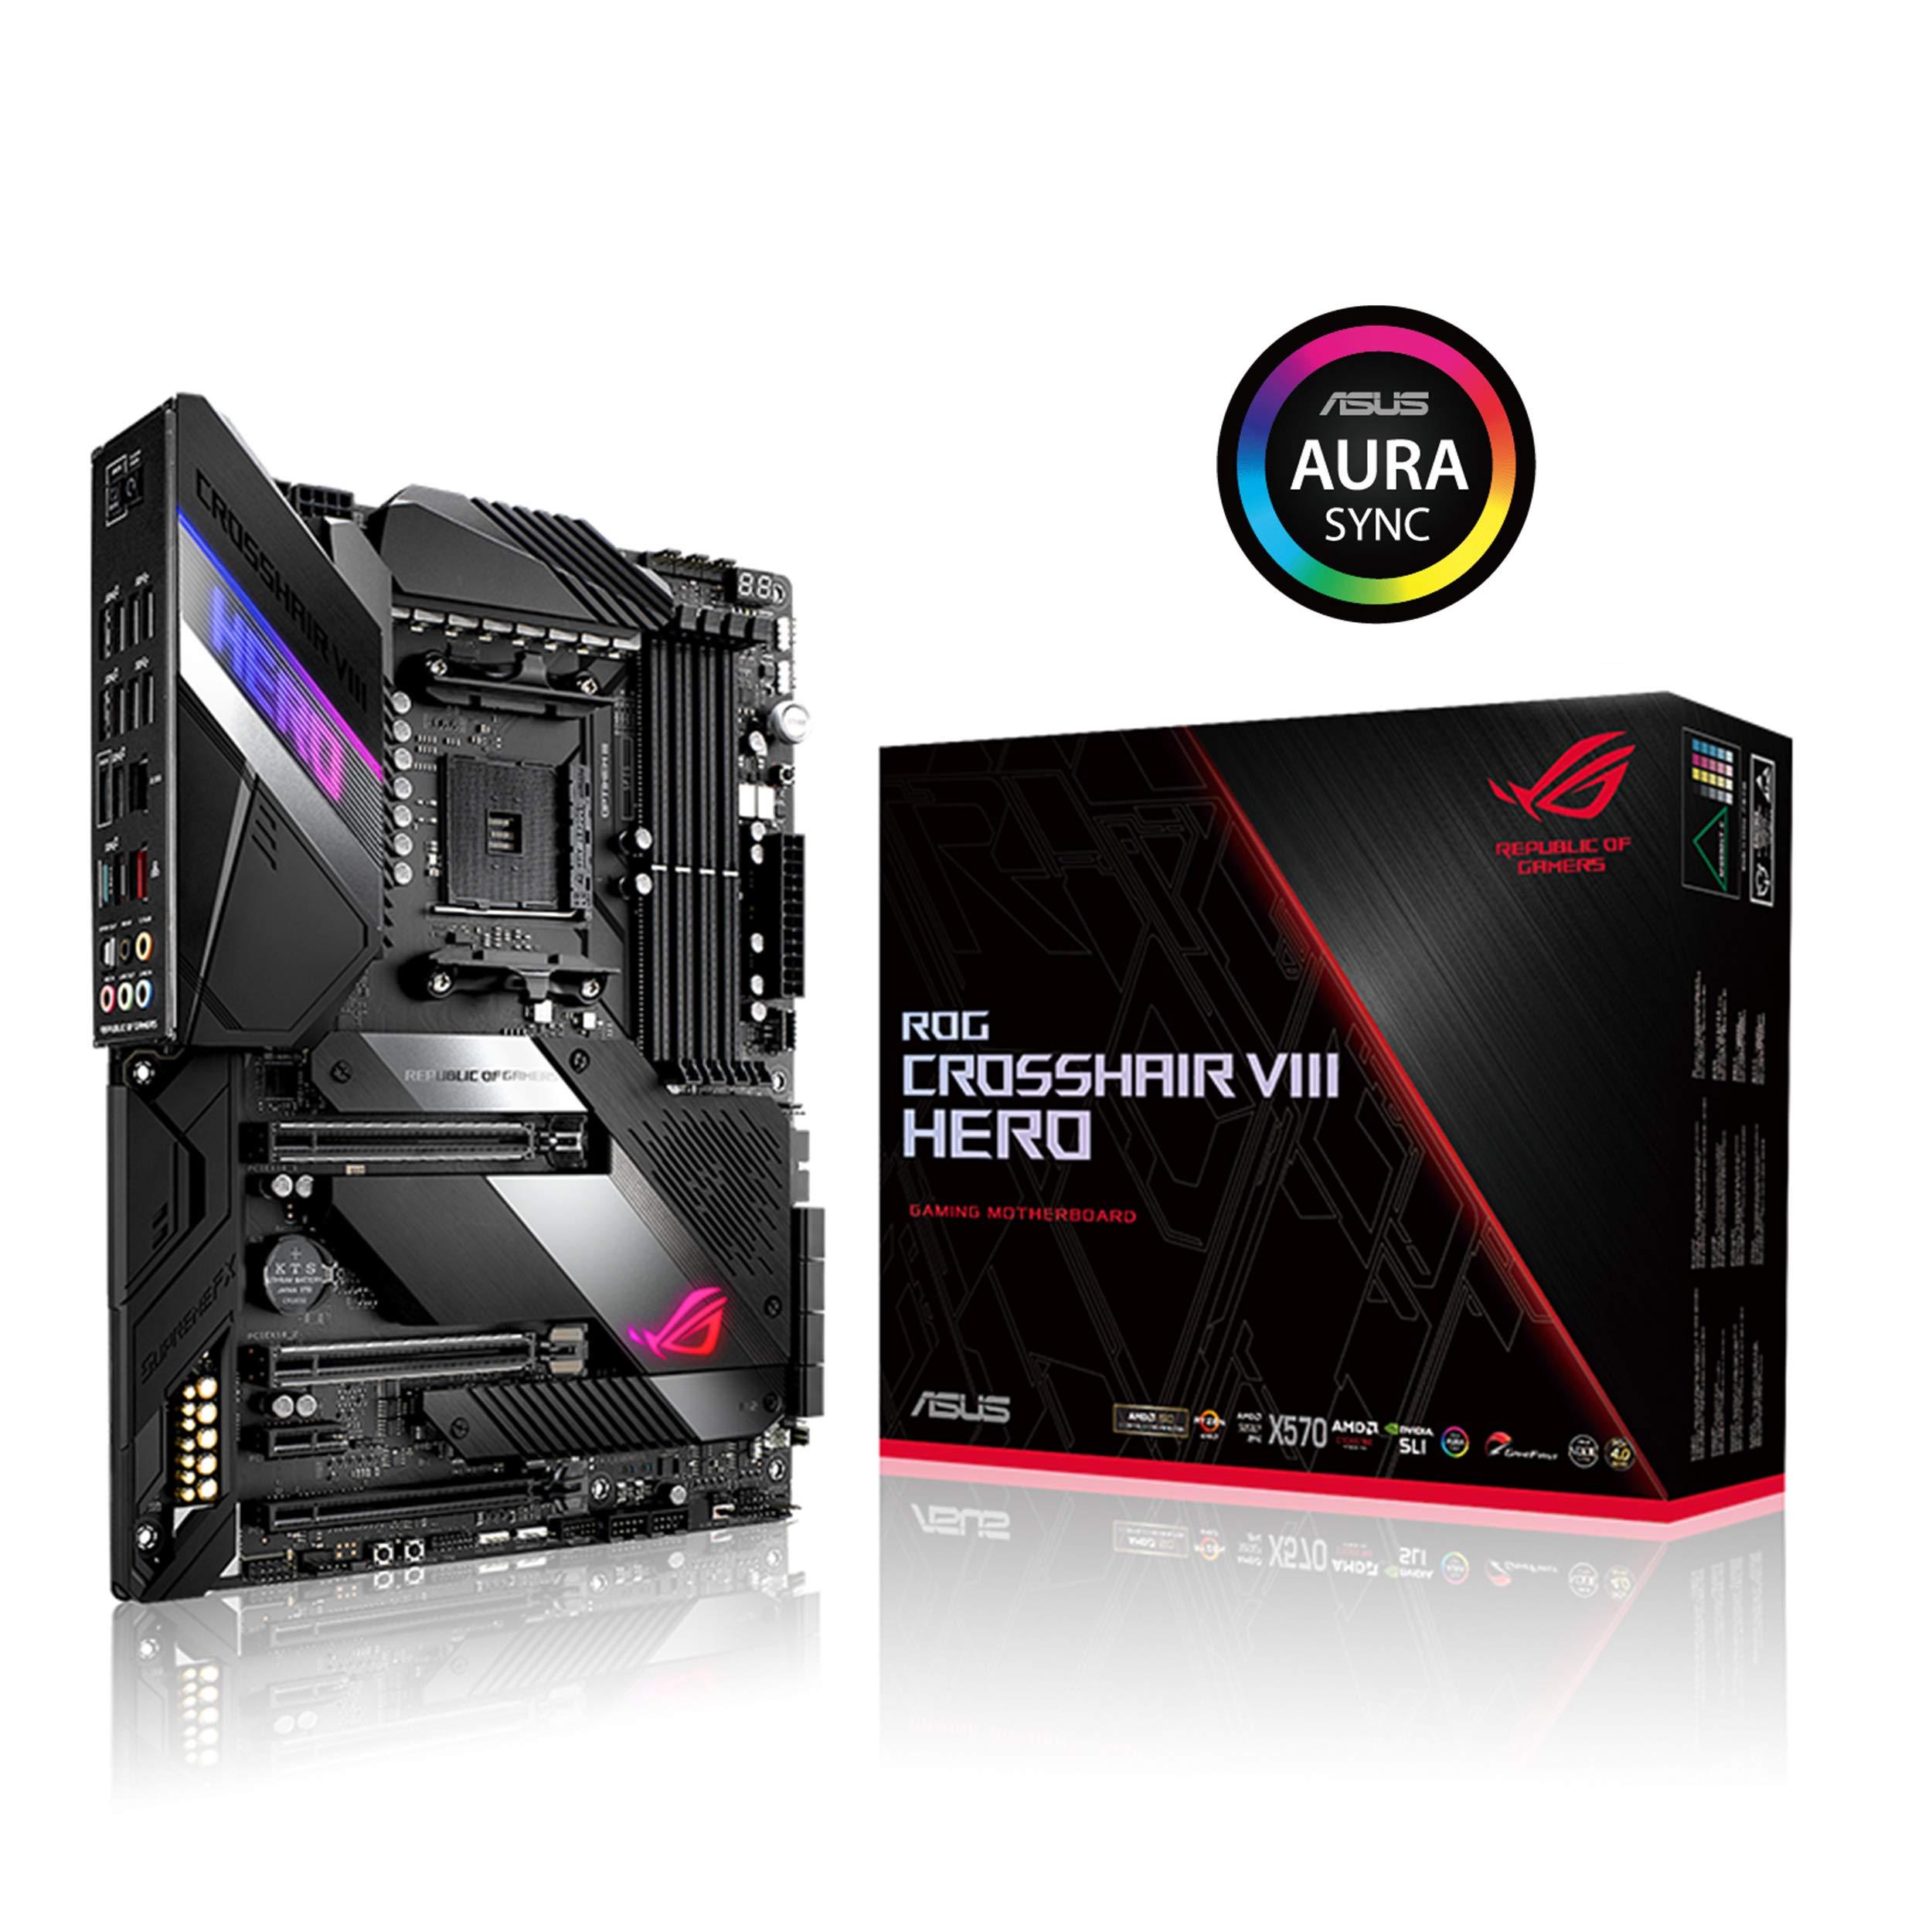 ASUS ROG Crosshair VIII Hero X570 ATX Motherboard with PC...